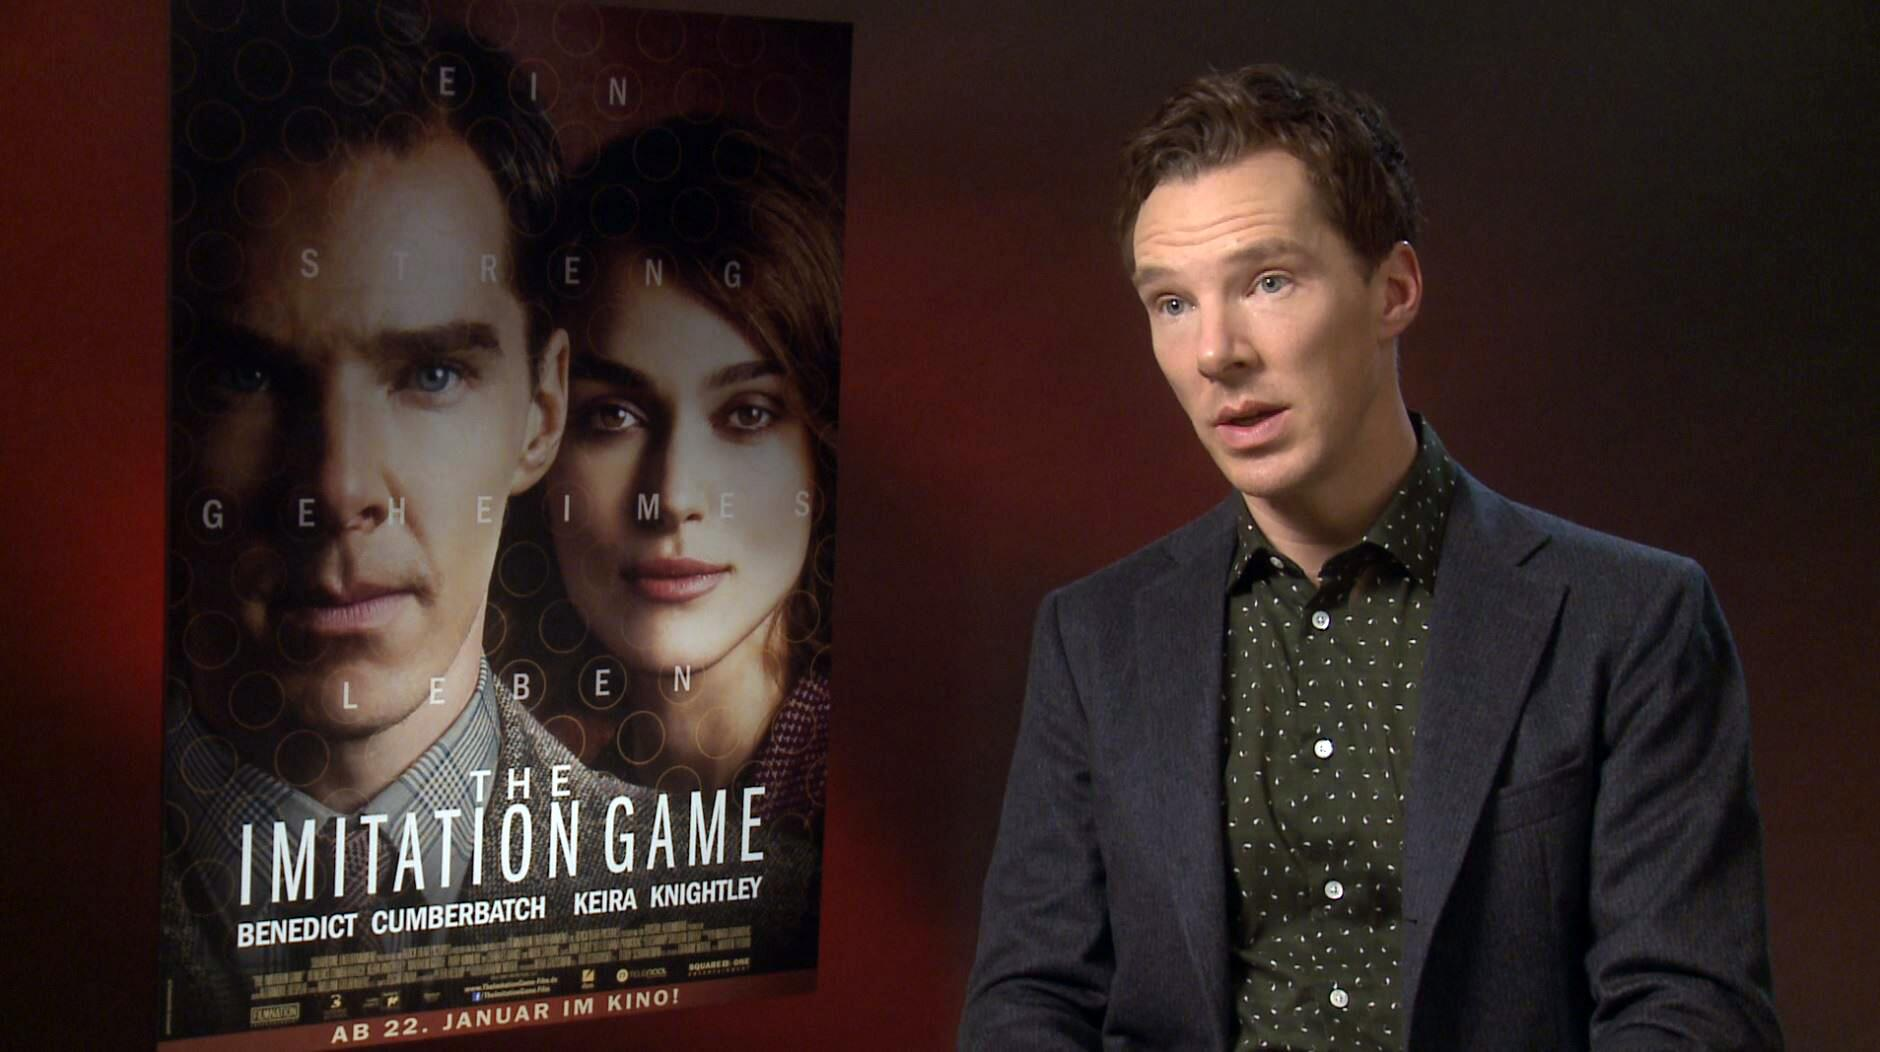 Bild zu Benedict Cumberbatch, Imitation Game